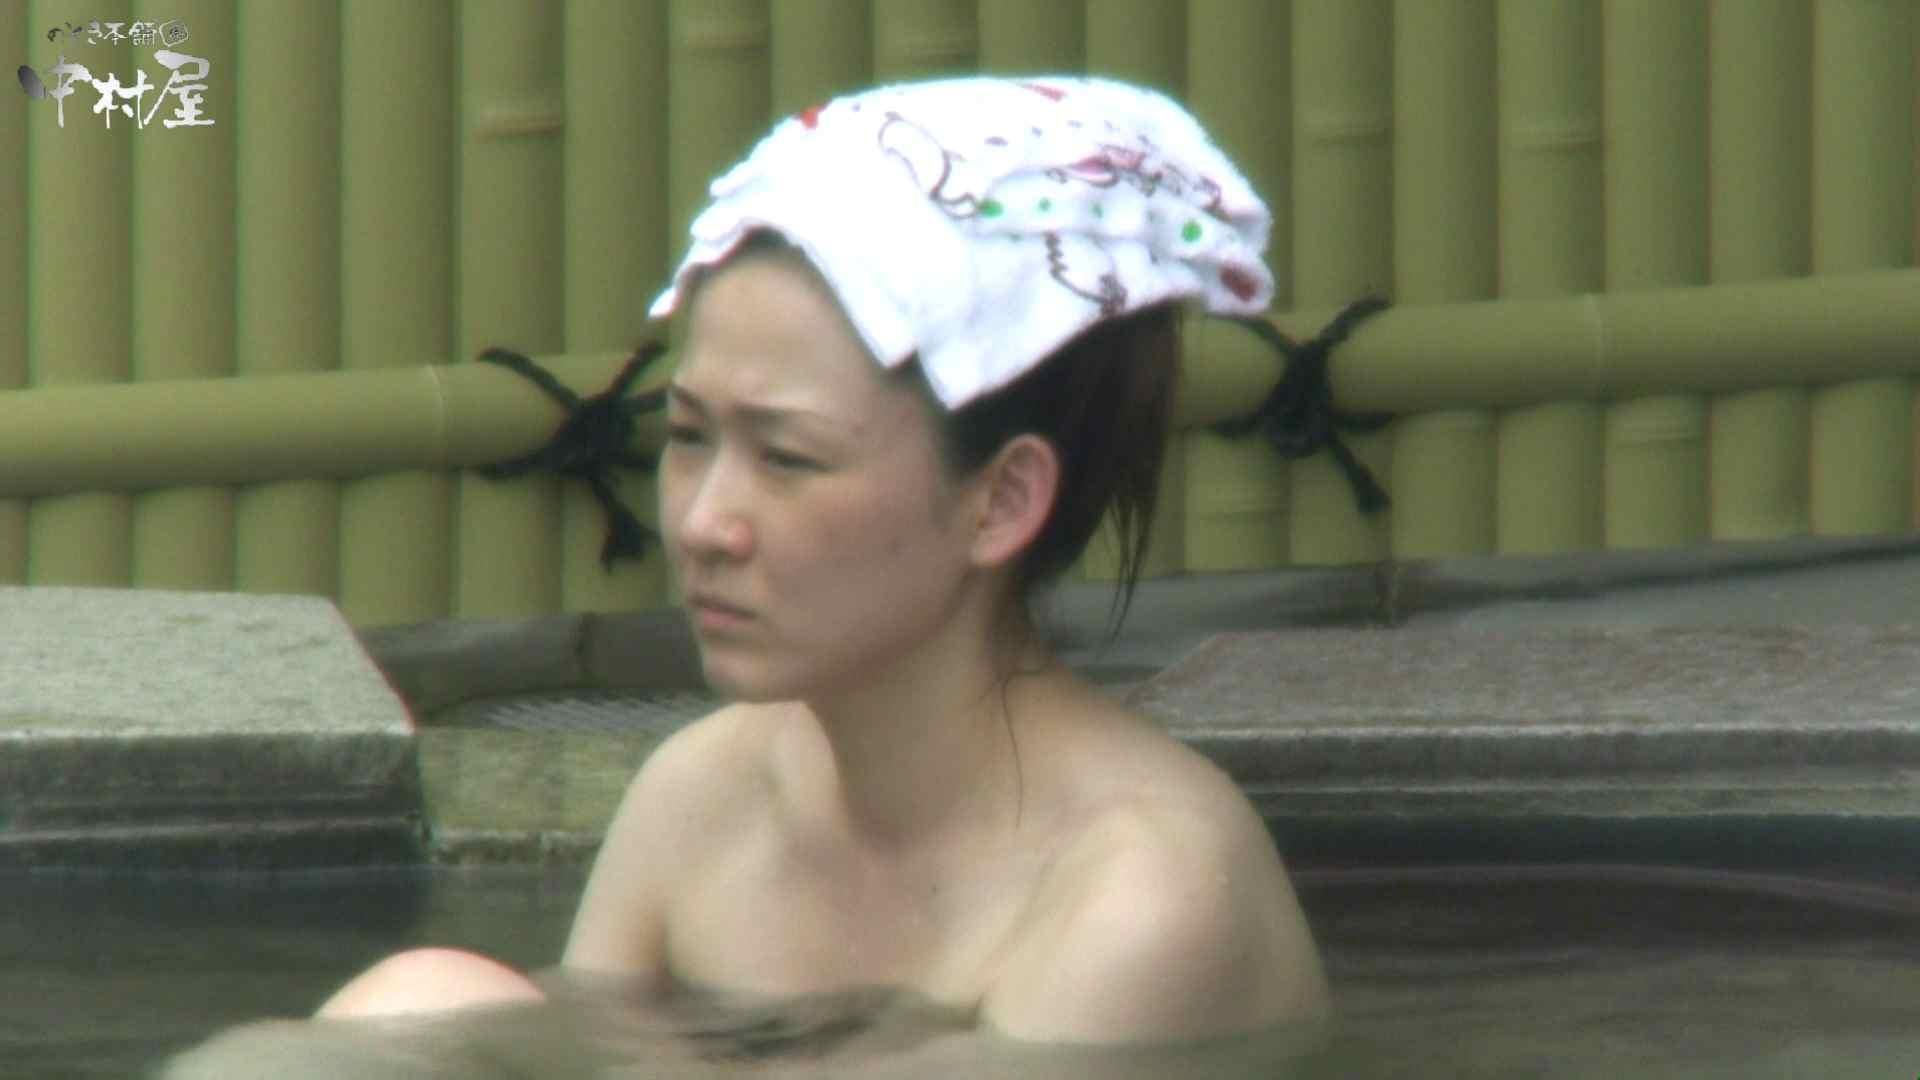 Aquaな露天風呂Vol.943 盗撮 セックス無修正動画無料 108画像 17